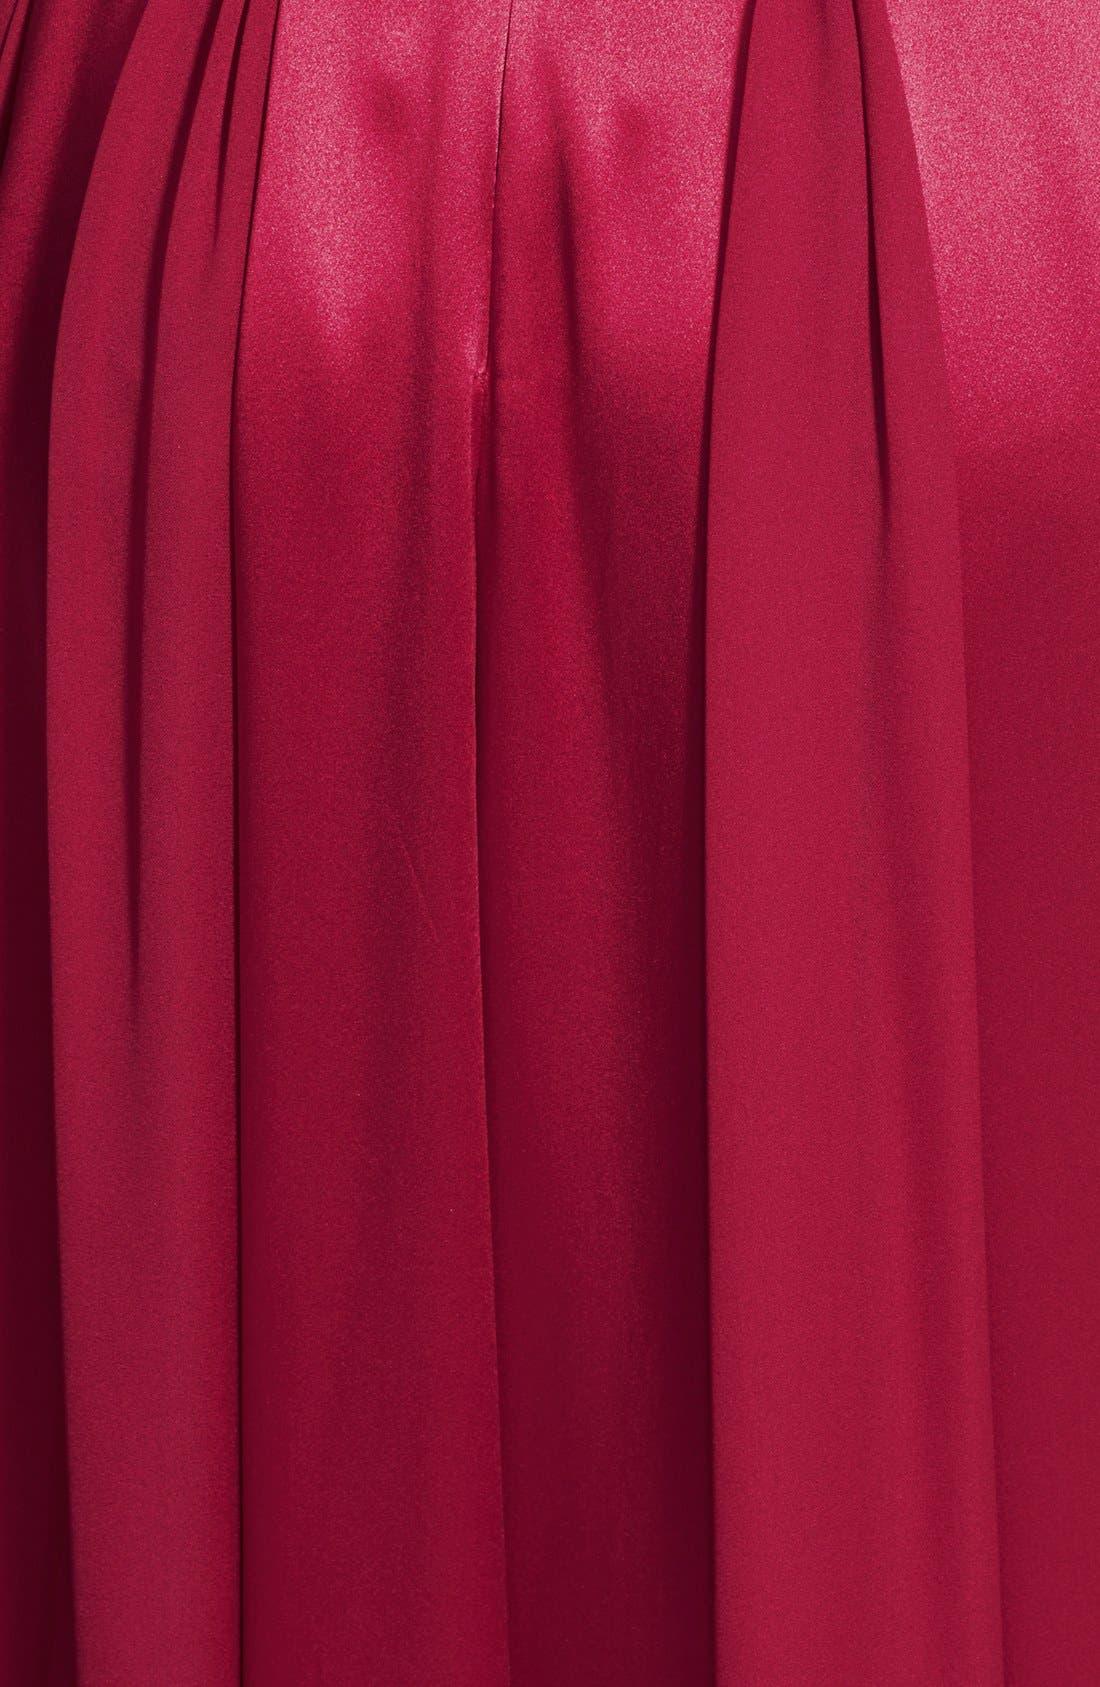 Alternate Image 3  - Halston Heritage Satin Fit & Flare Gown